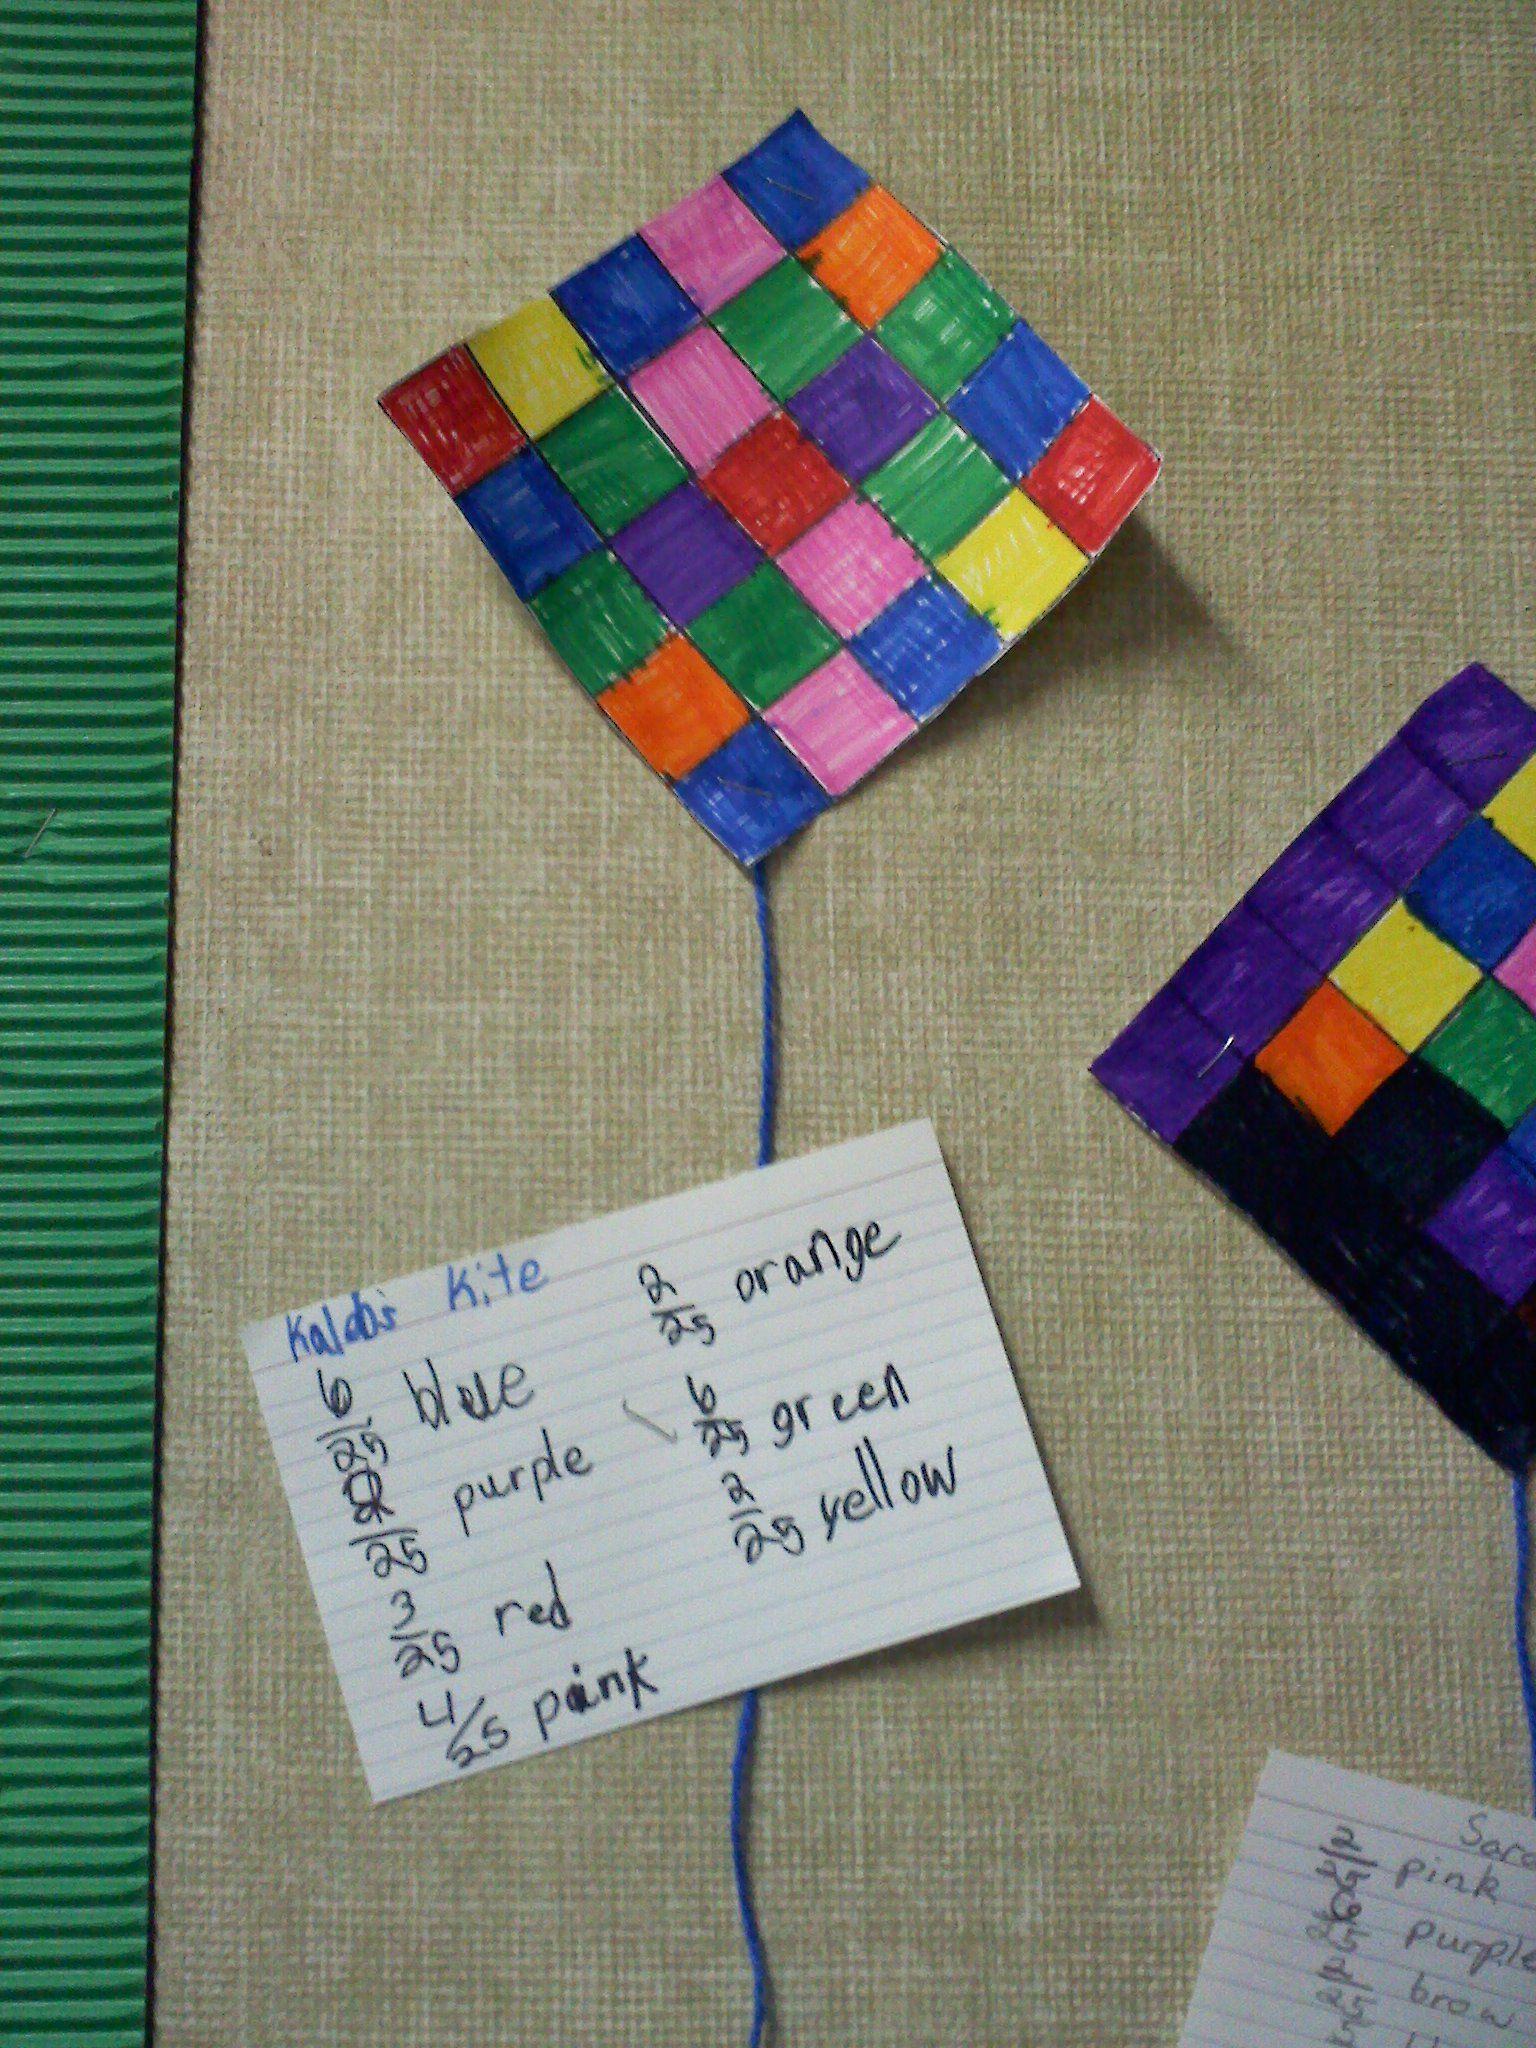 Our Fraction Kites